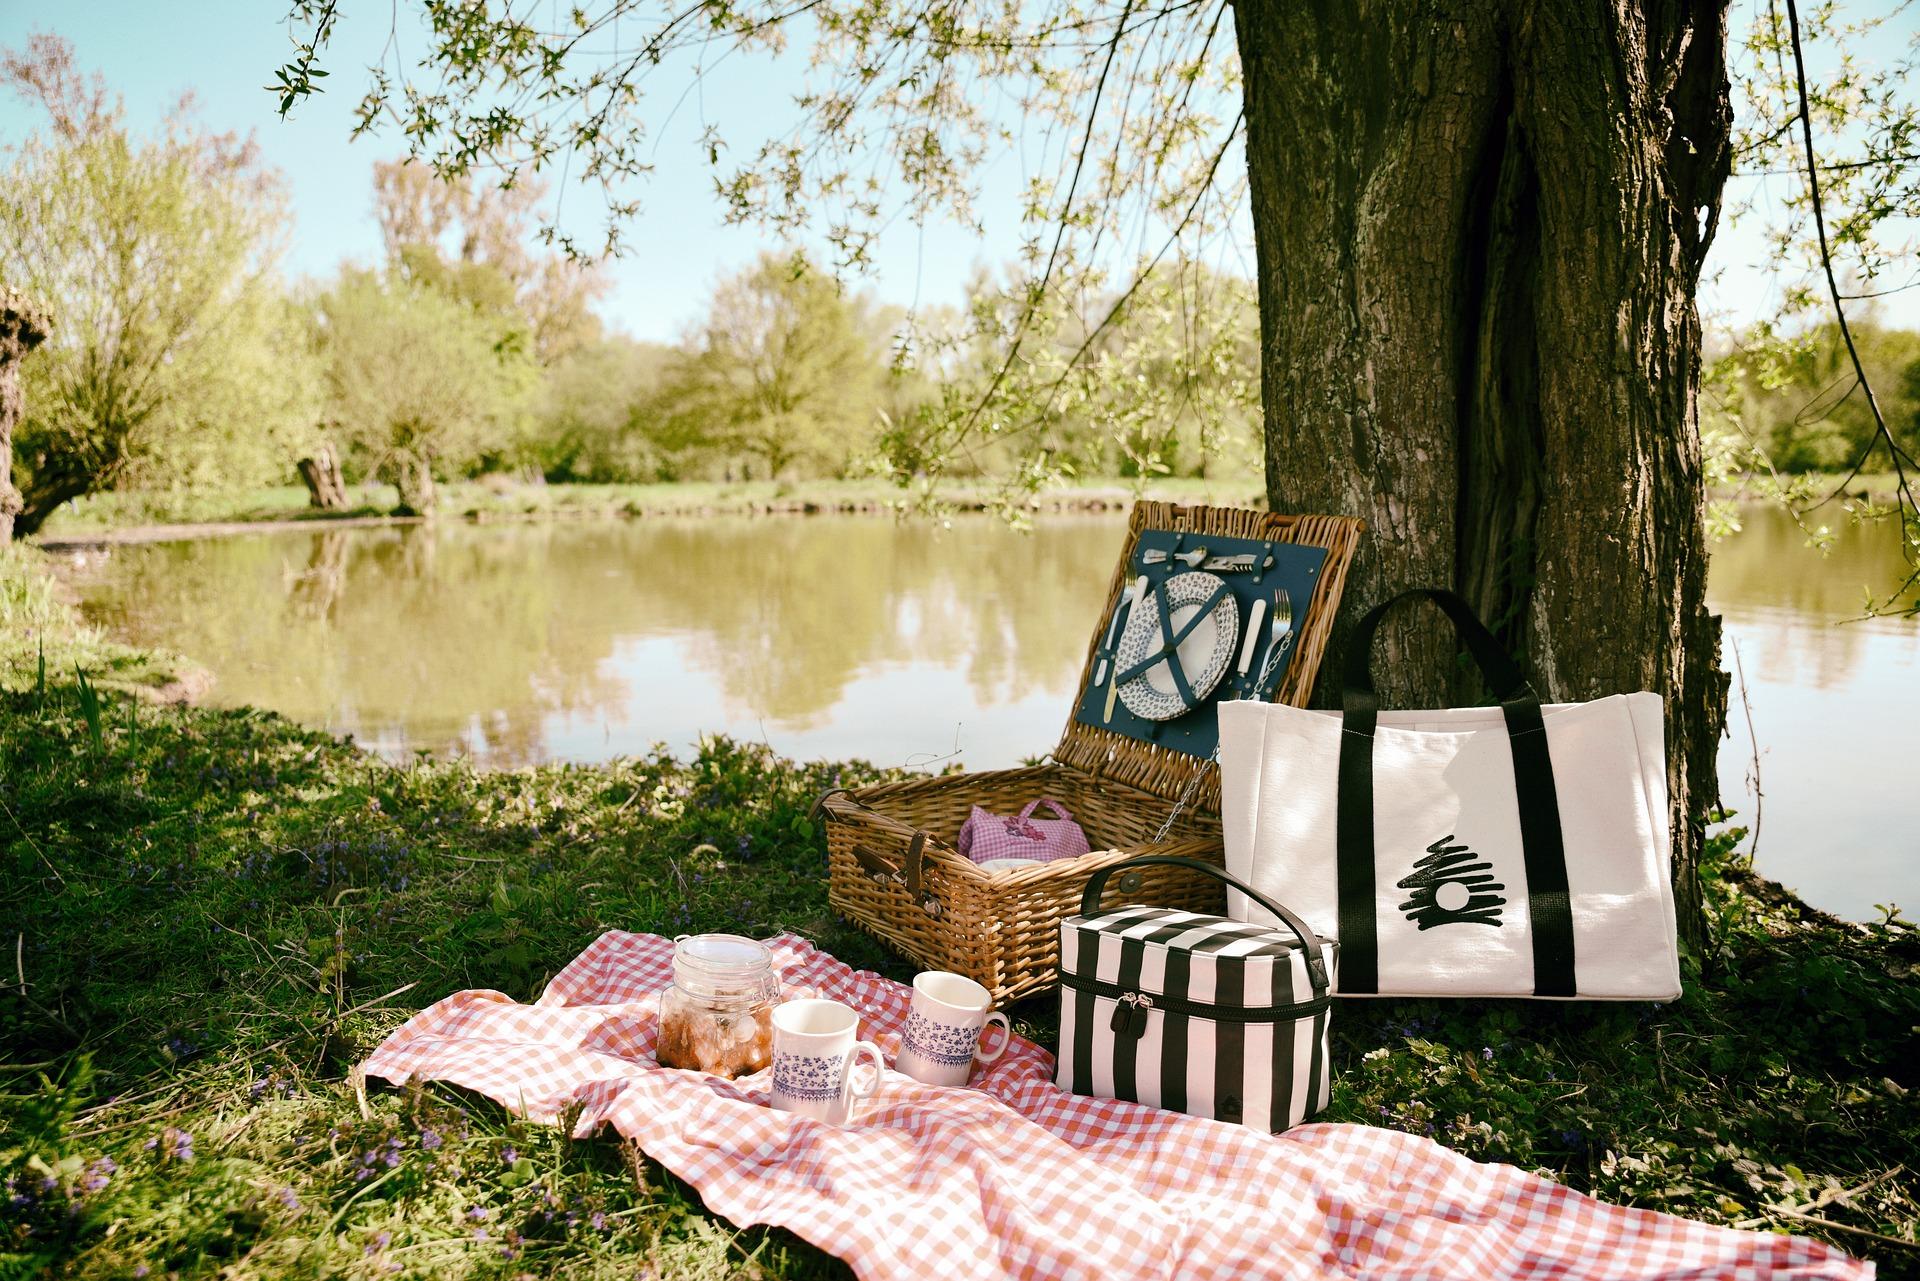 picnic-3474130_1920